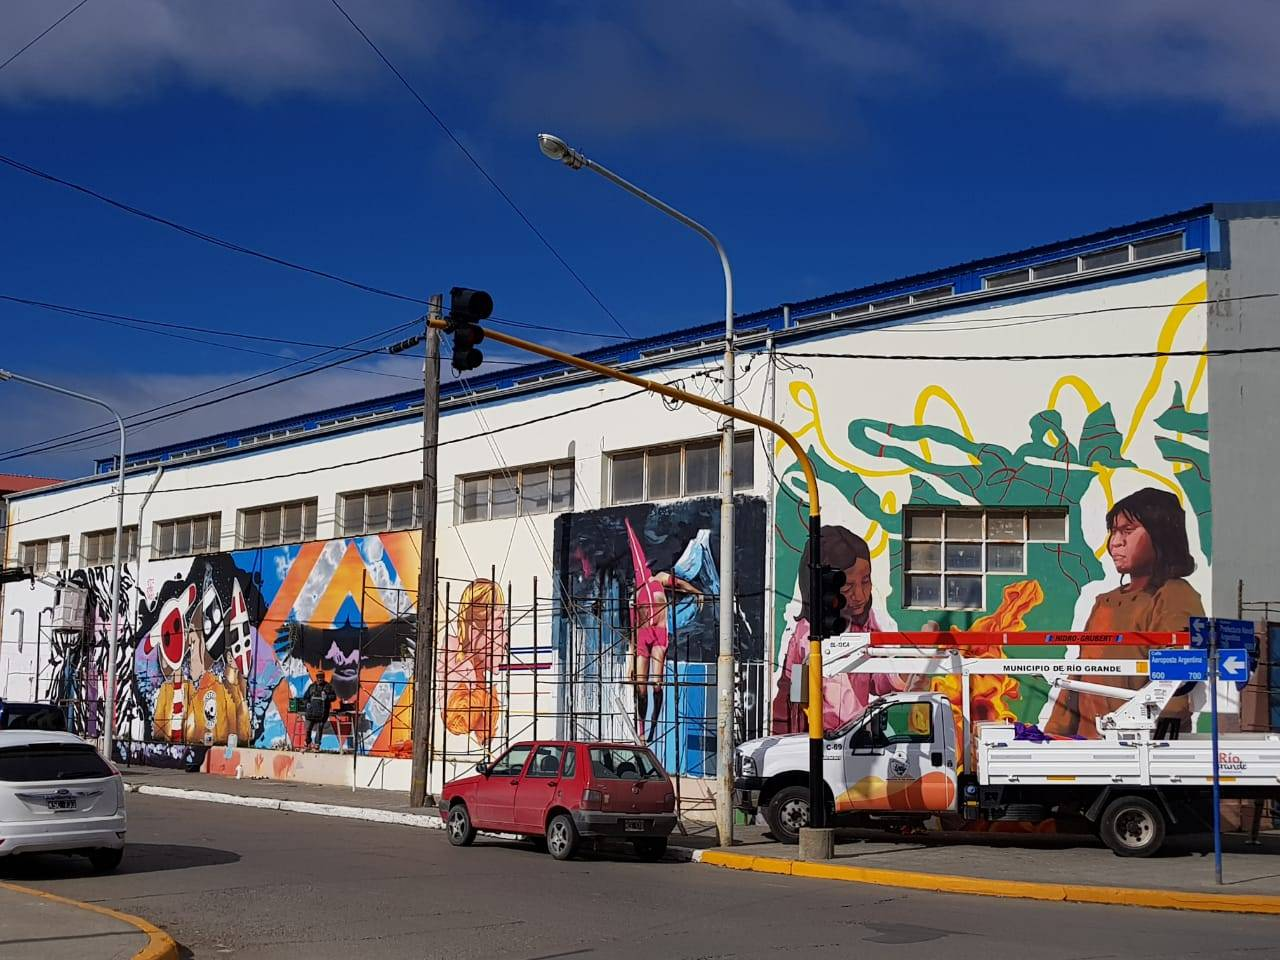 Festival de arte público urbano Curva, urban art, street art